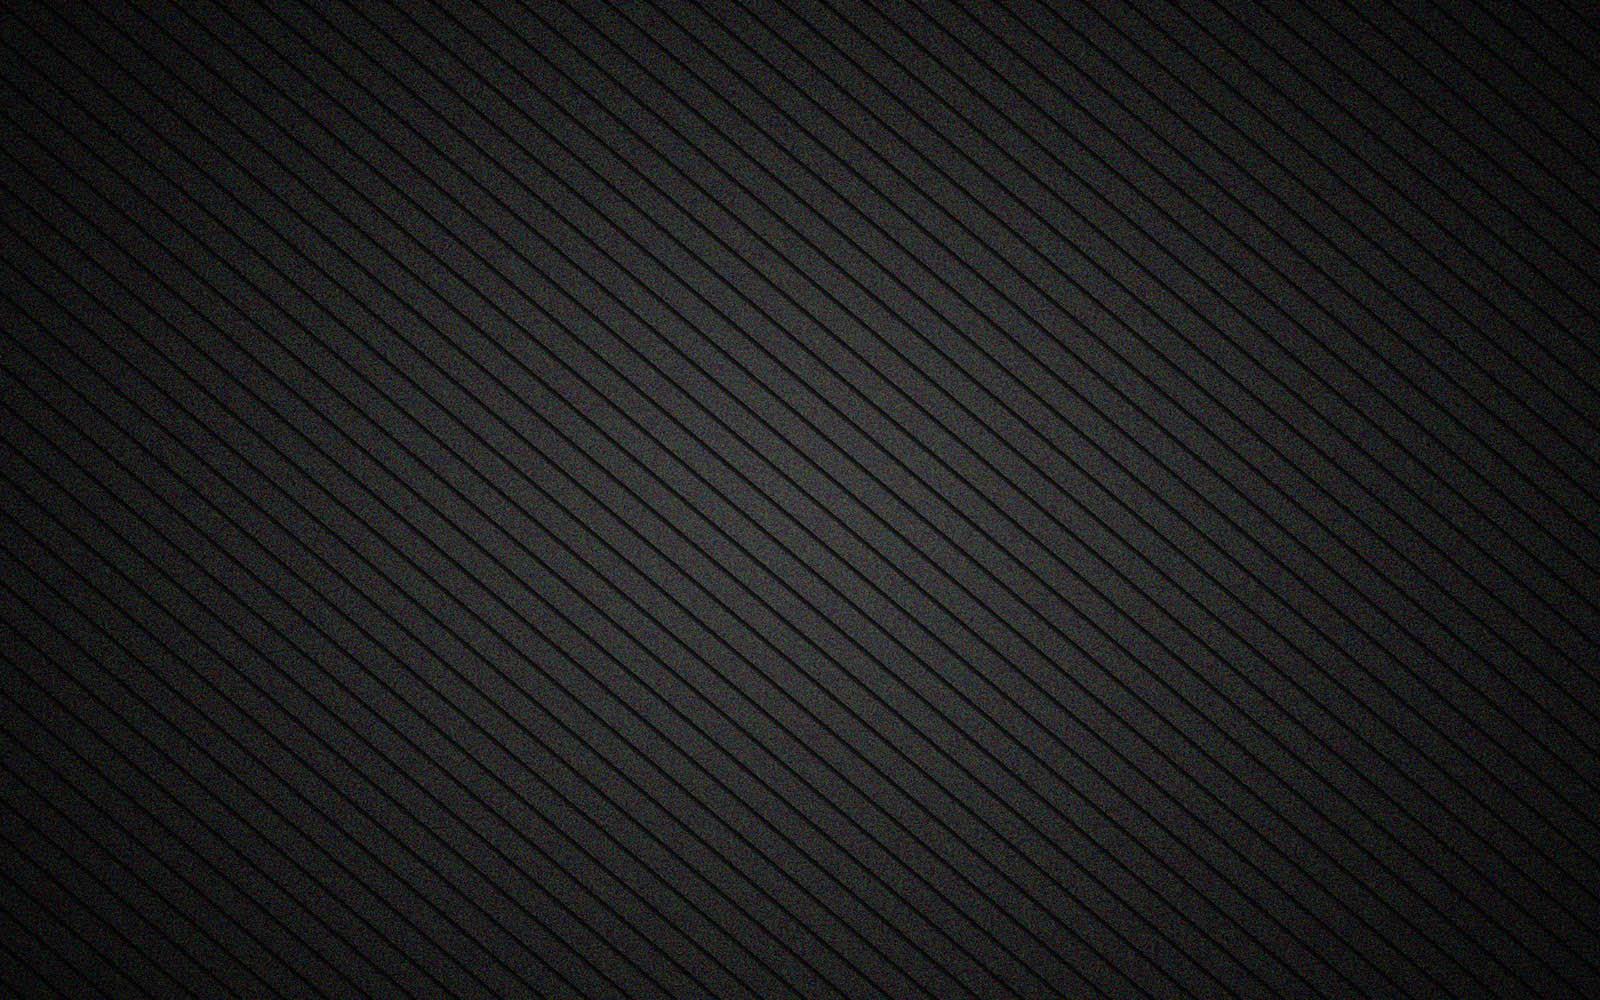 black wallpaper background pc - photo #22